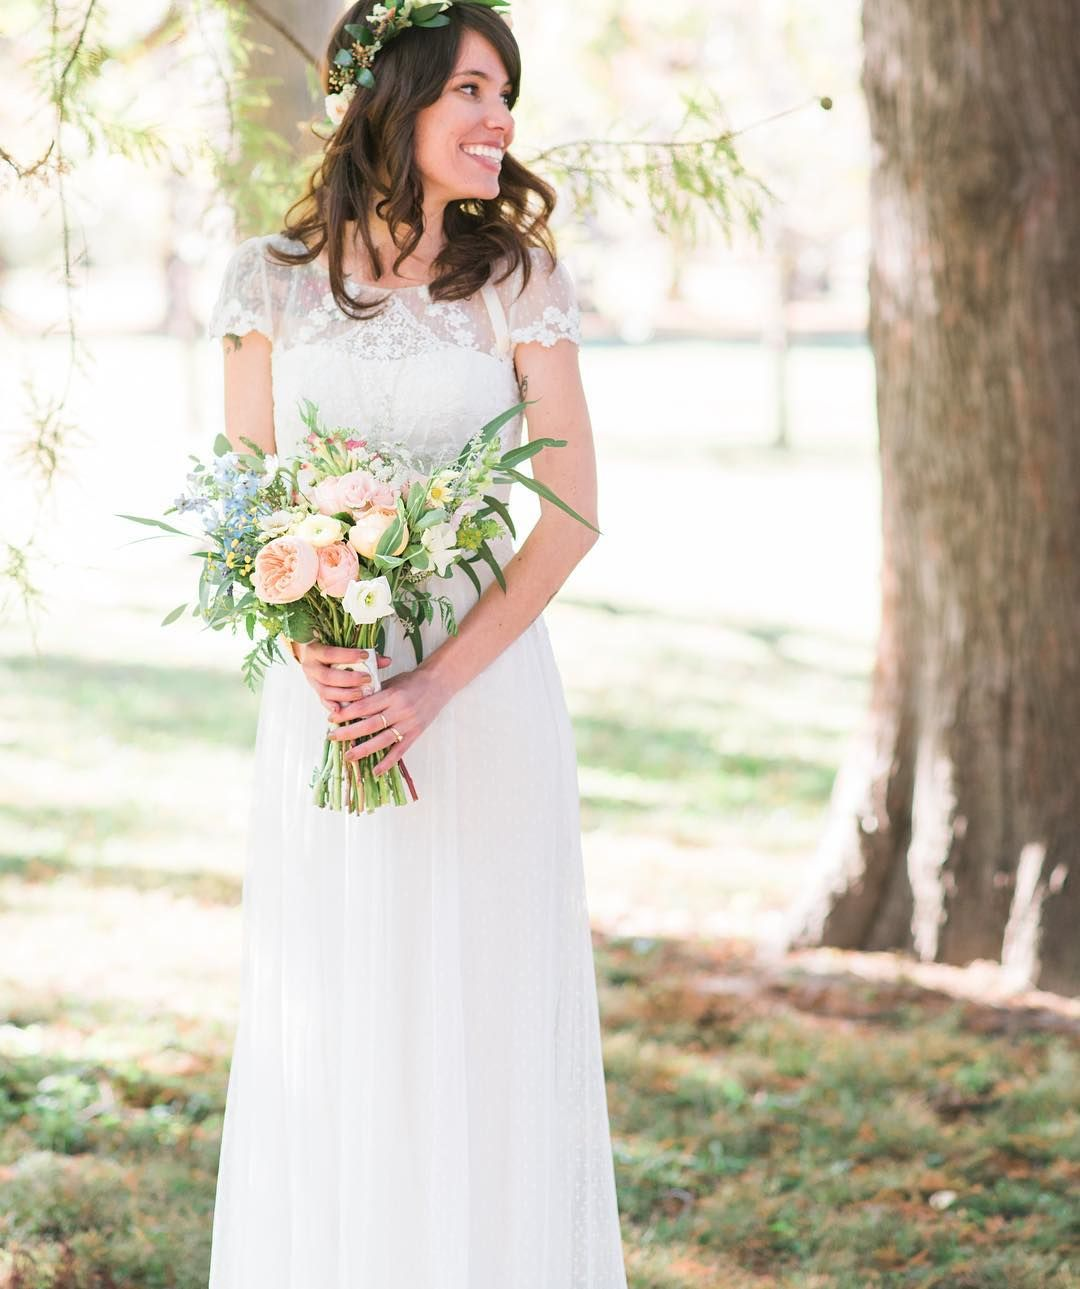 David 39 s bridal bride rita in a cap sleeve tulle sheath for Sheath wedding dress with cap sleeves